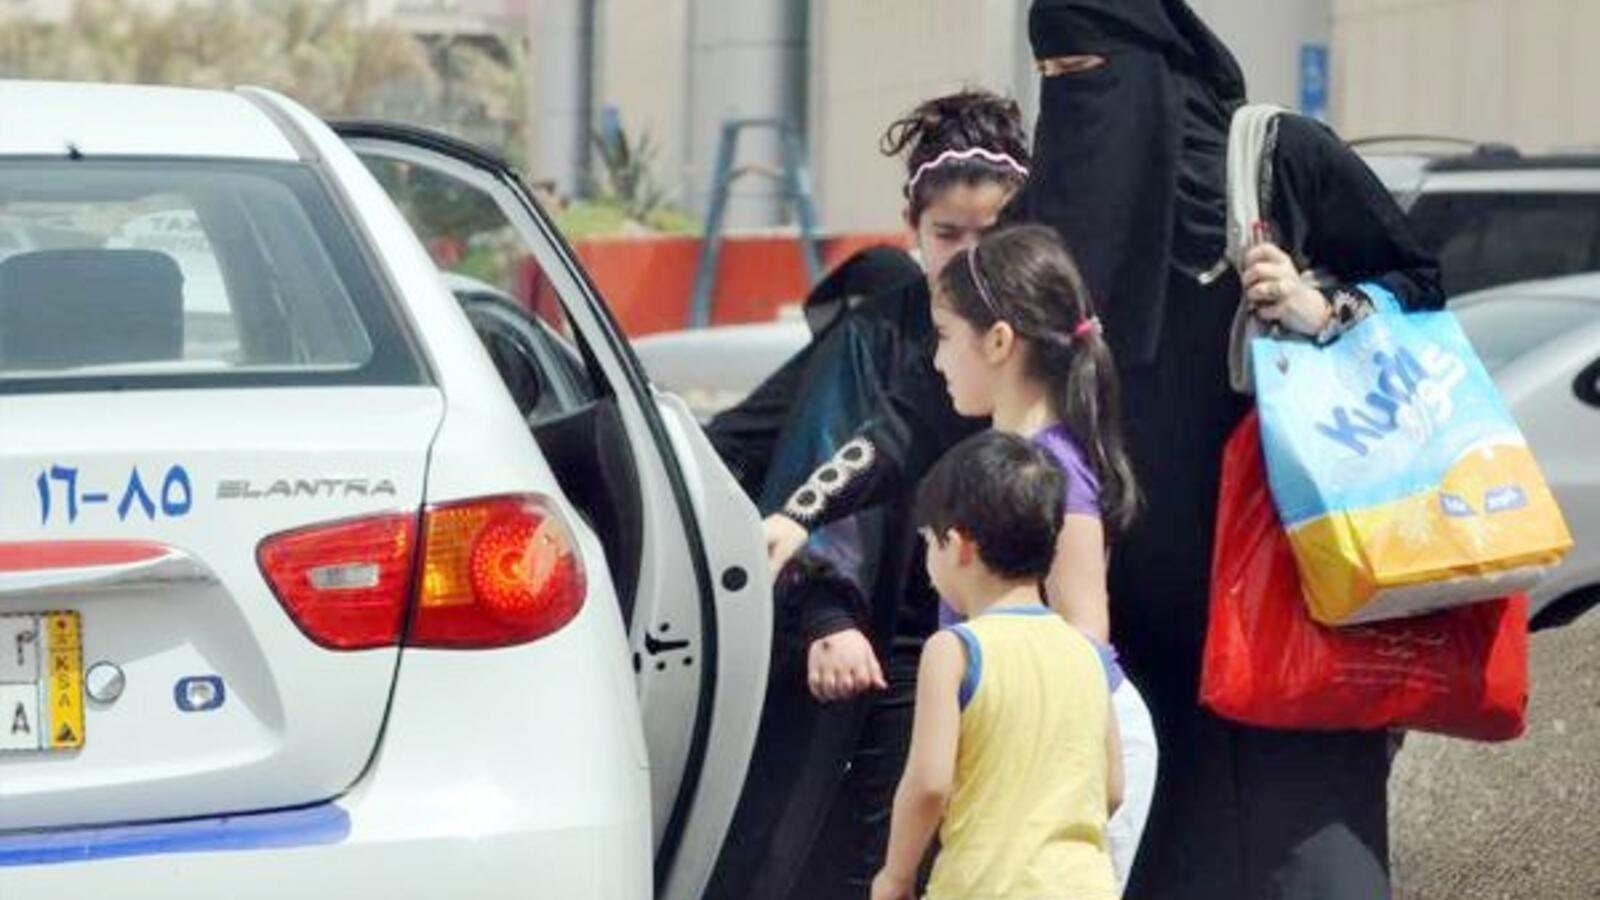 Saudi Arabia struggles to resolve transportation problems